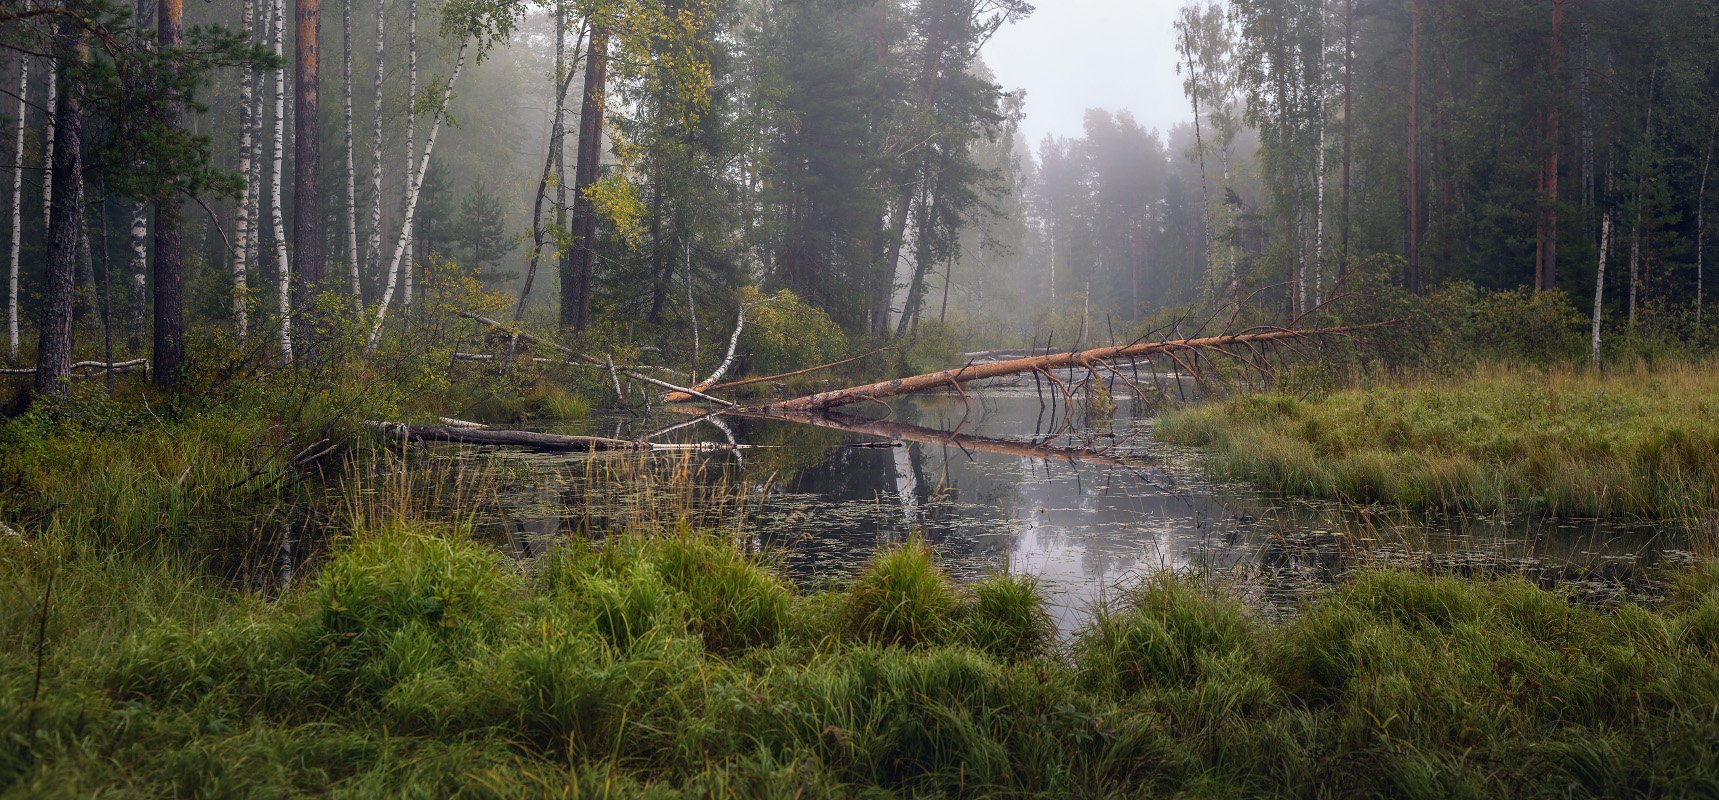 суходол сентябрь туман, Дмитрий Алексеев